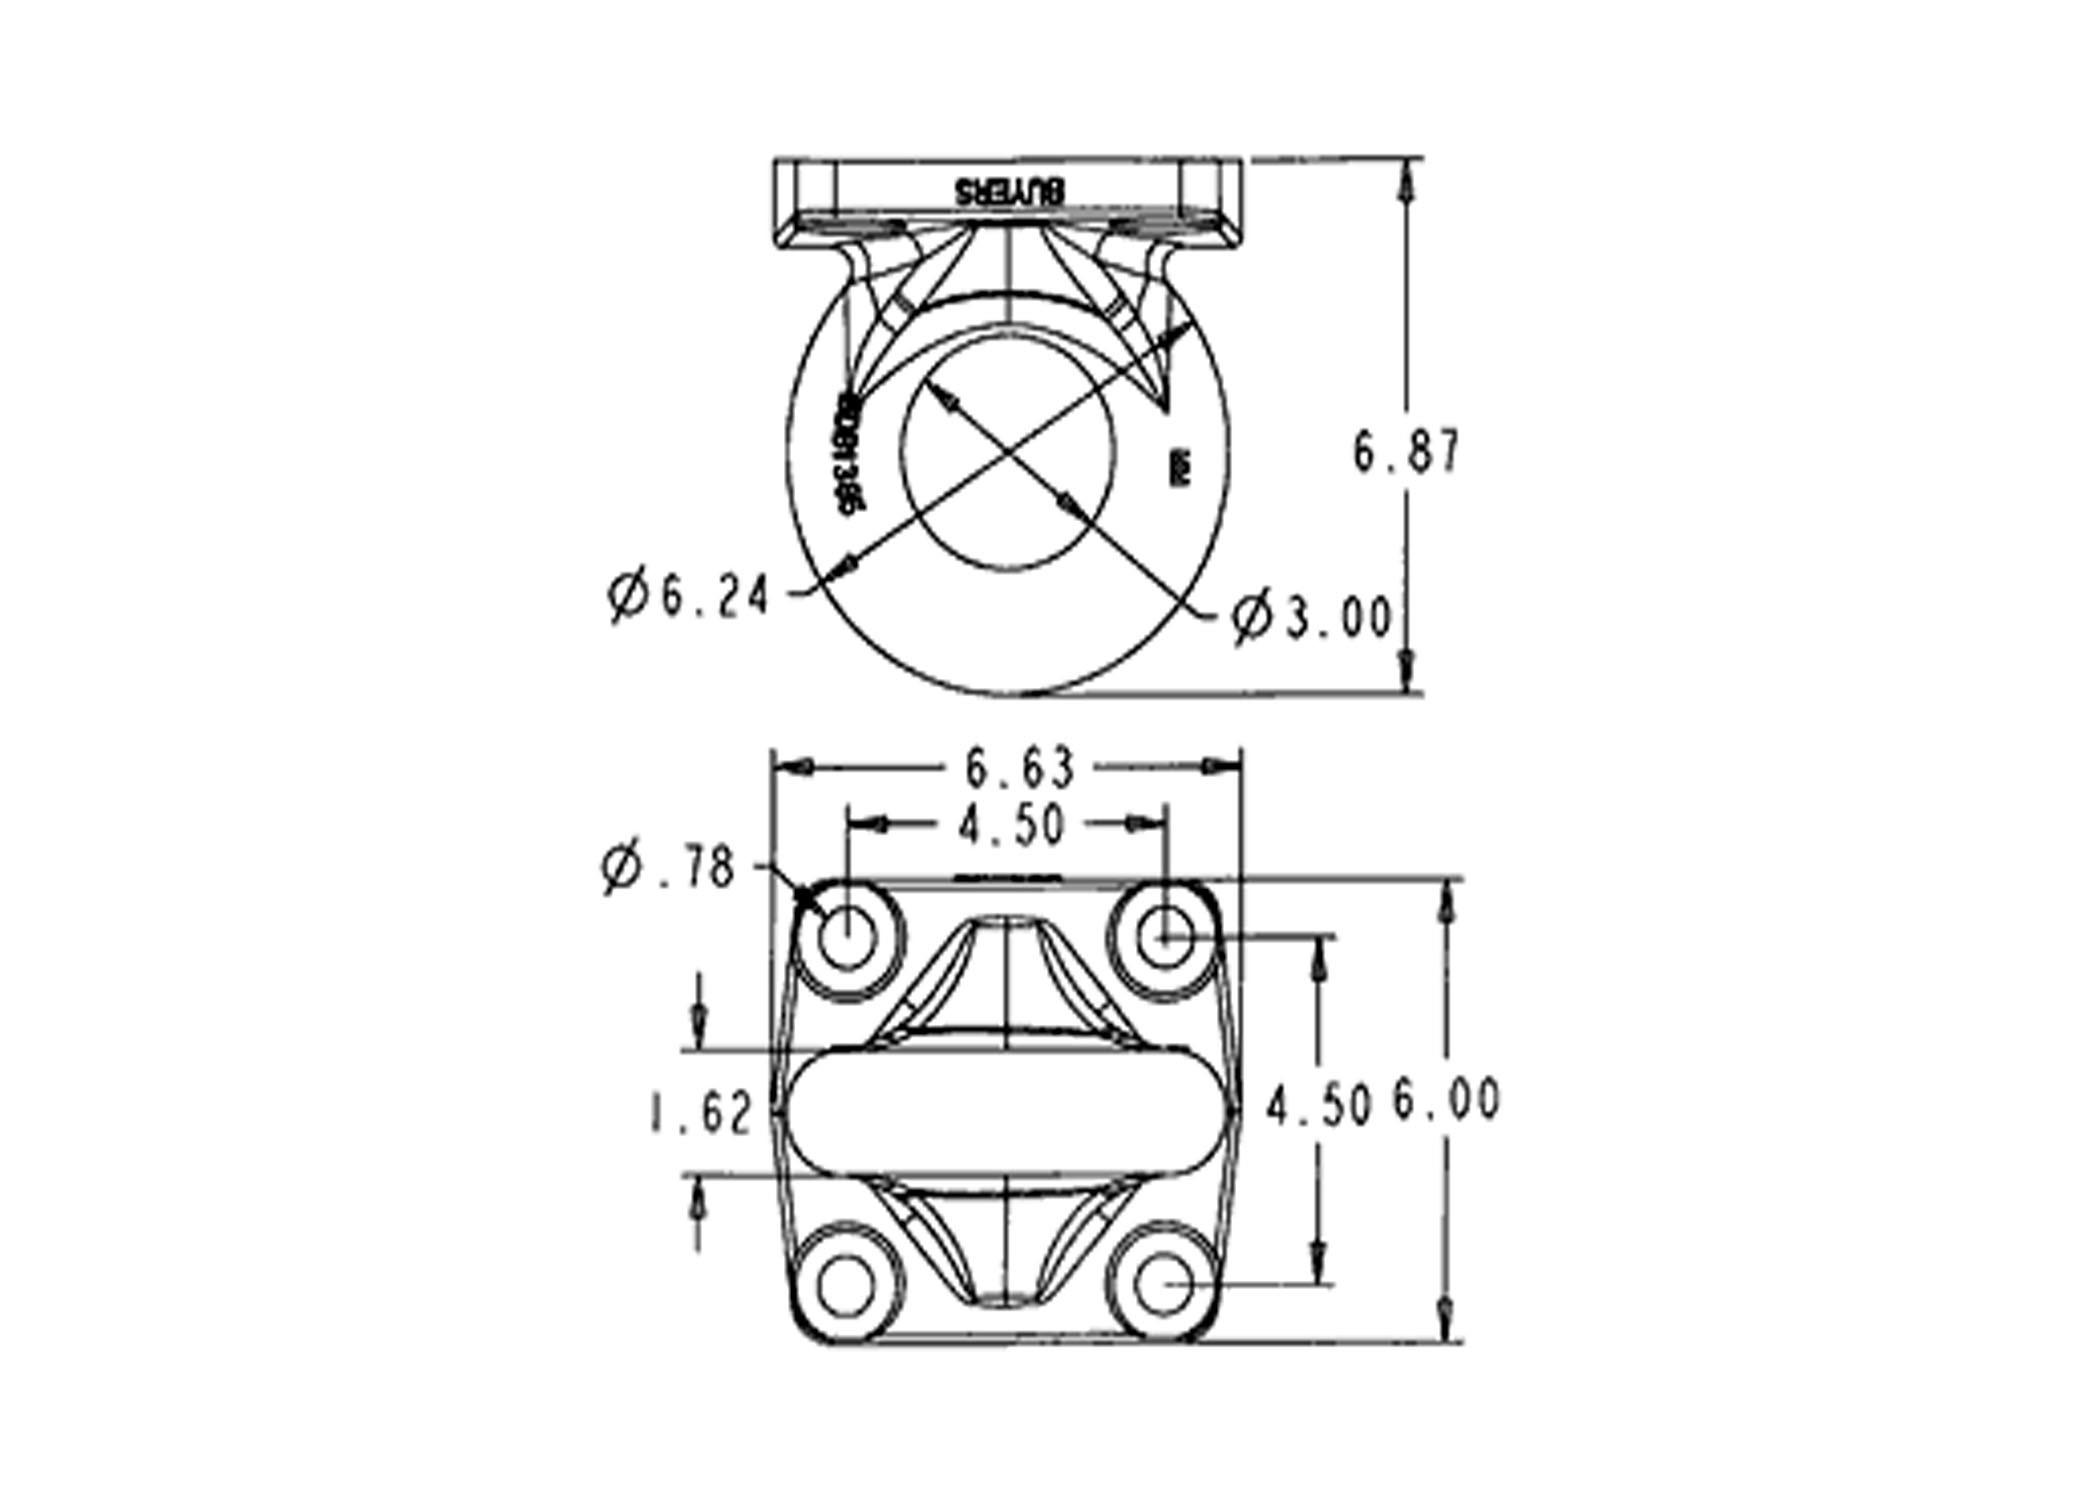 drawbar 4 bolt mount 30k - couplers  drawbars